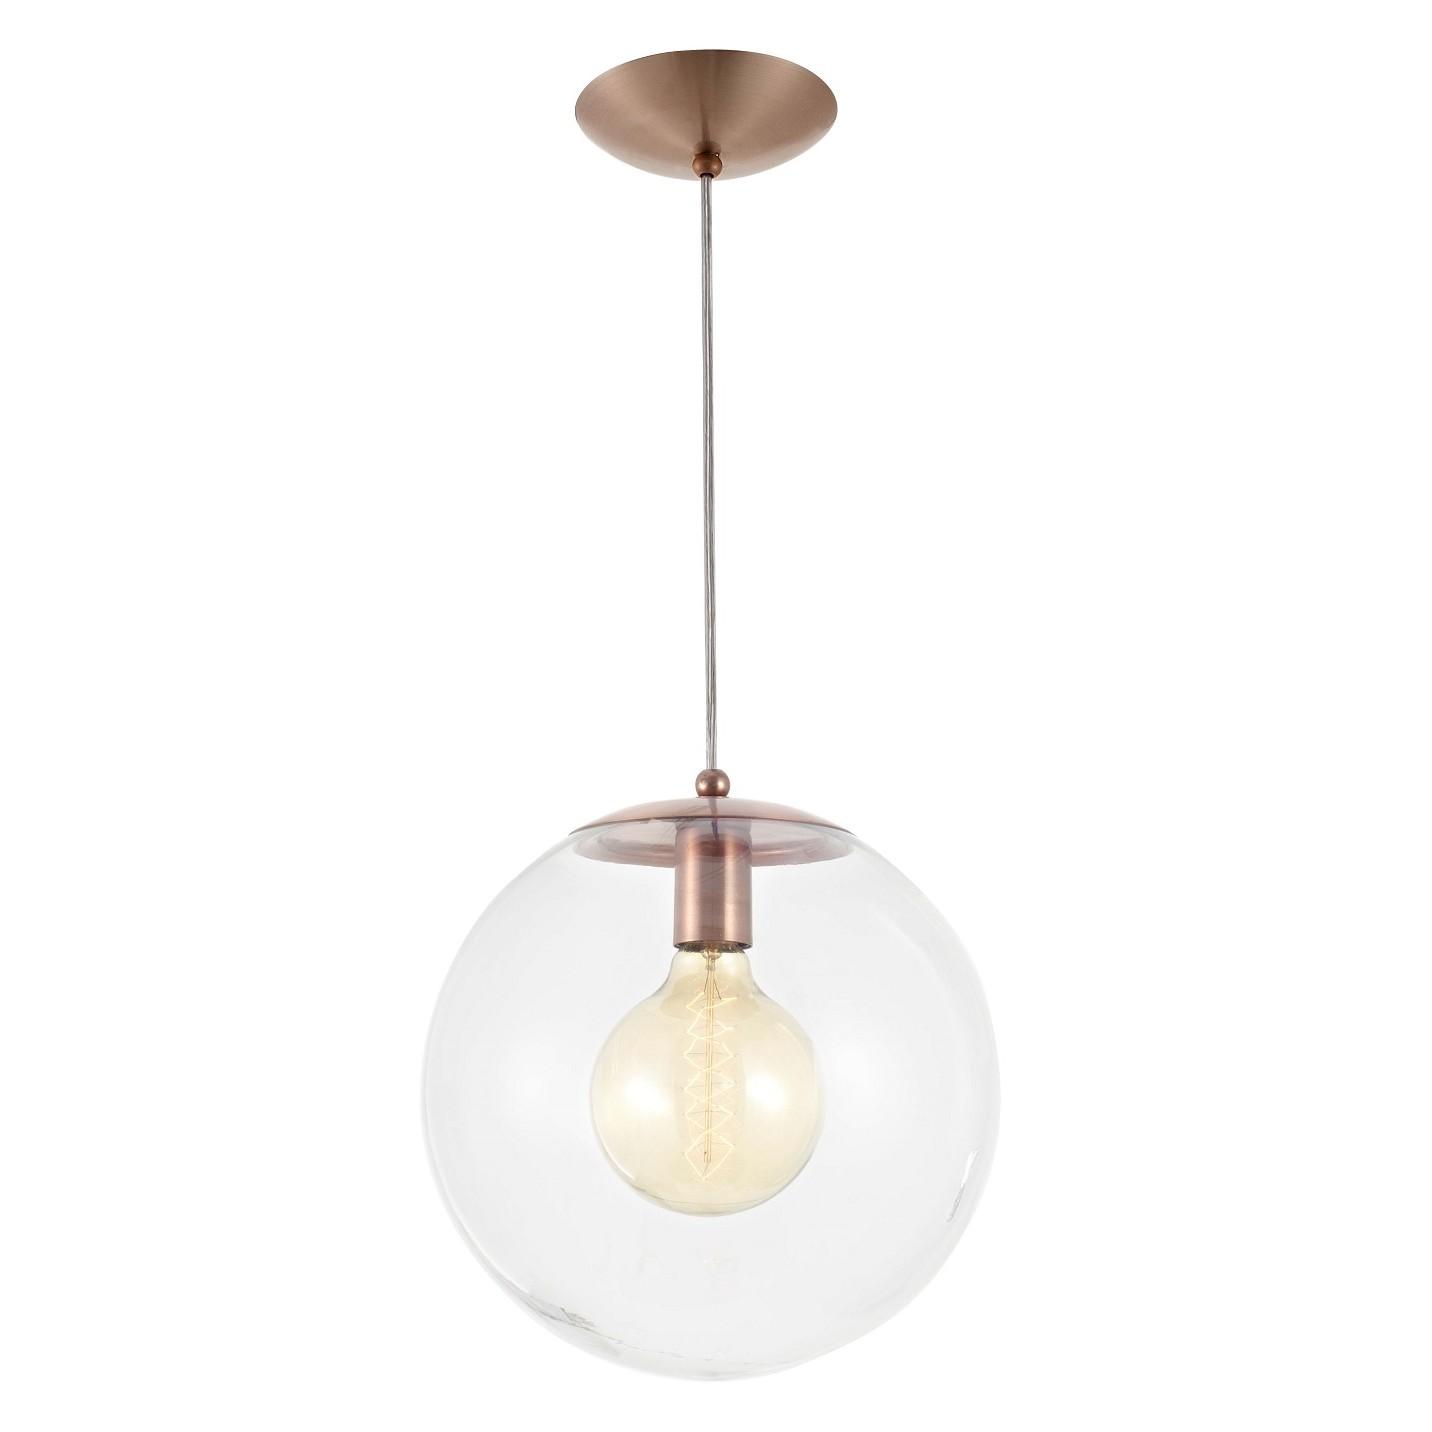 Pendente Esfera 30 cm 1 Lampada Cobre - Madelustre